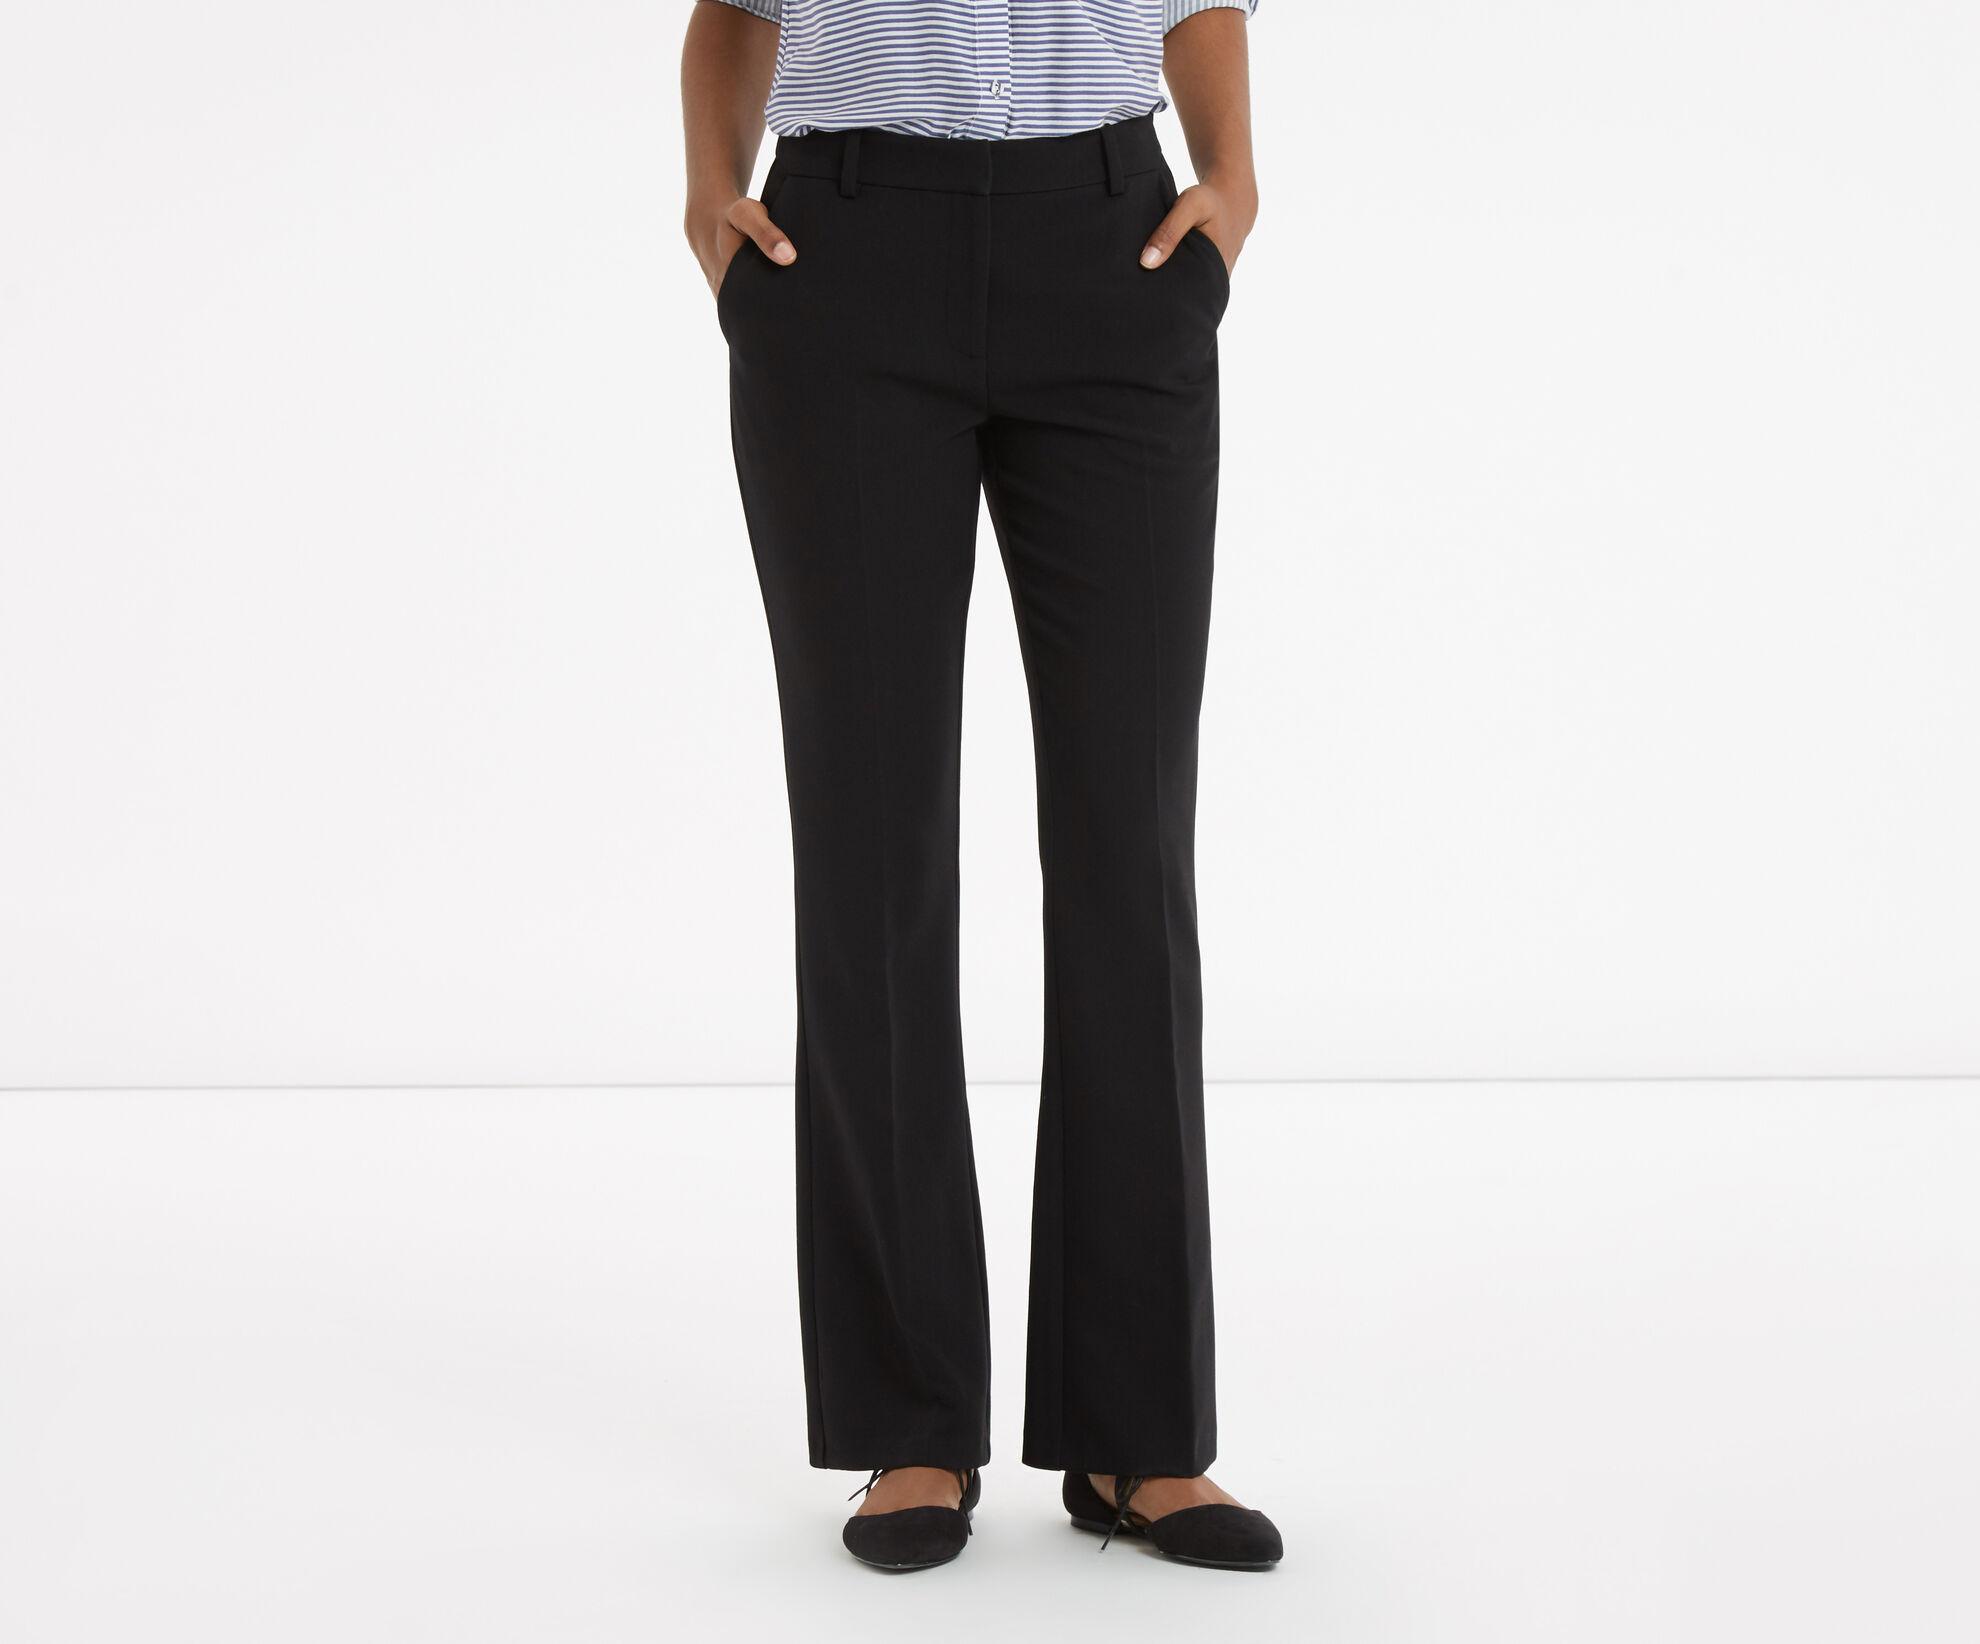 Oasis, Sian Wide Leg Trouser Black 1